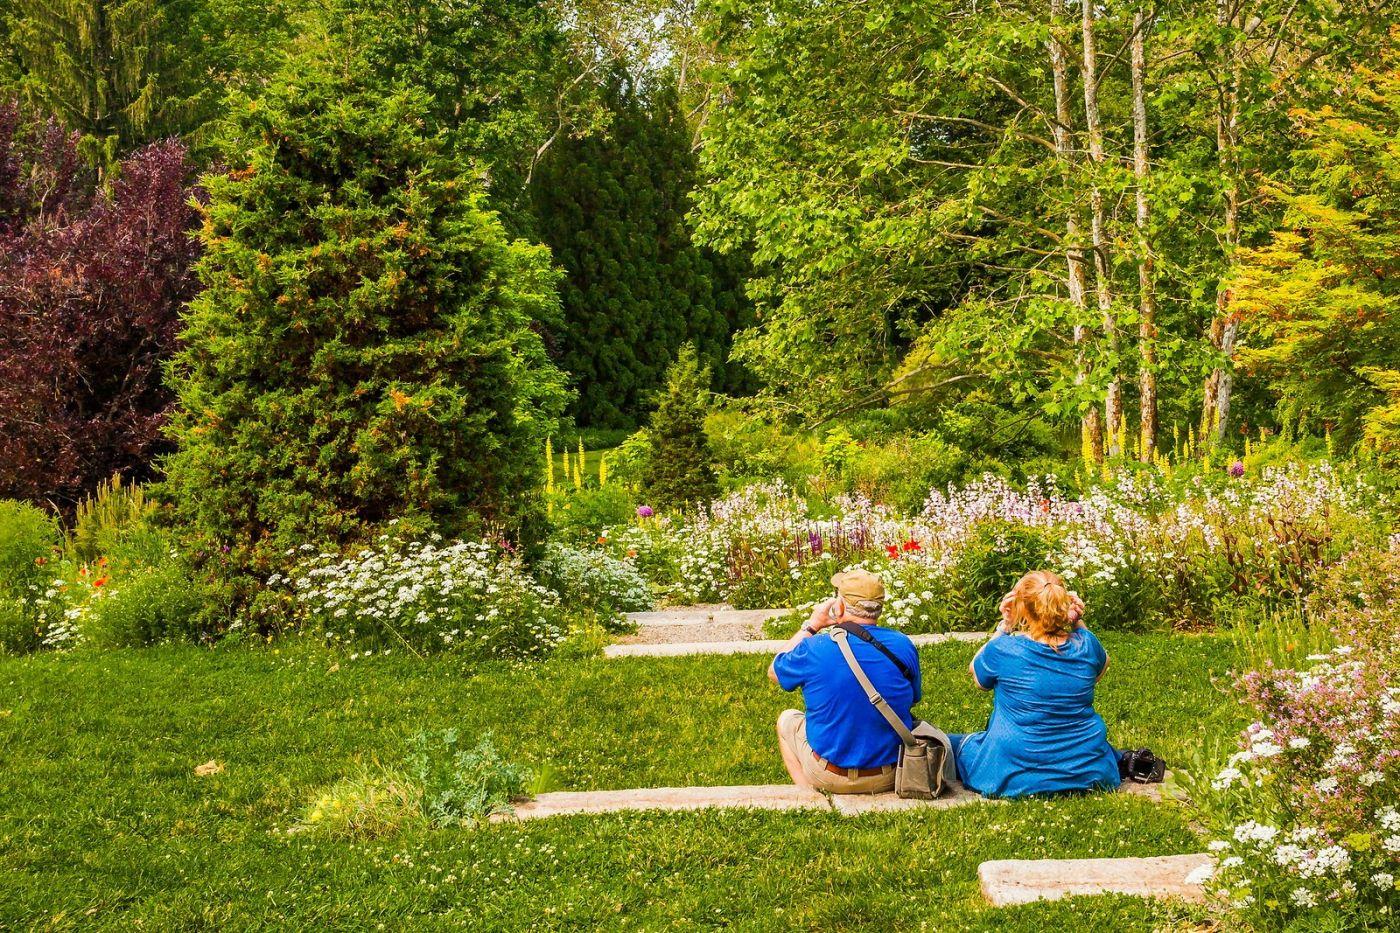 Chanticleer花园,享受大自然_图1-2